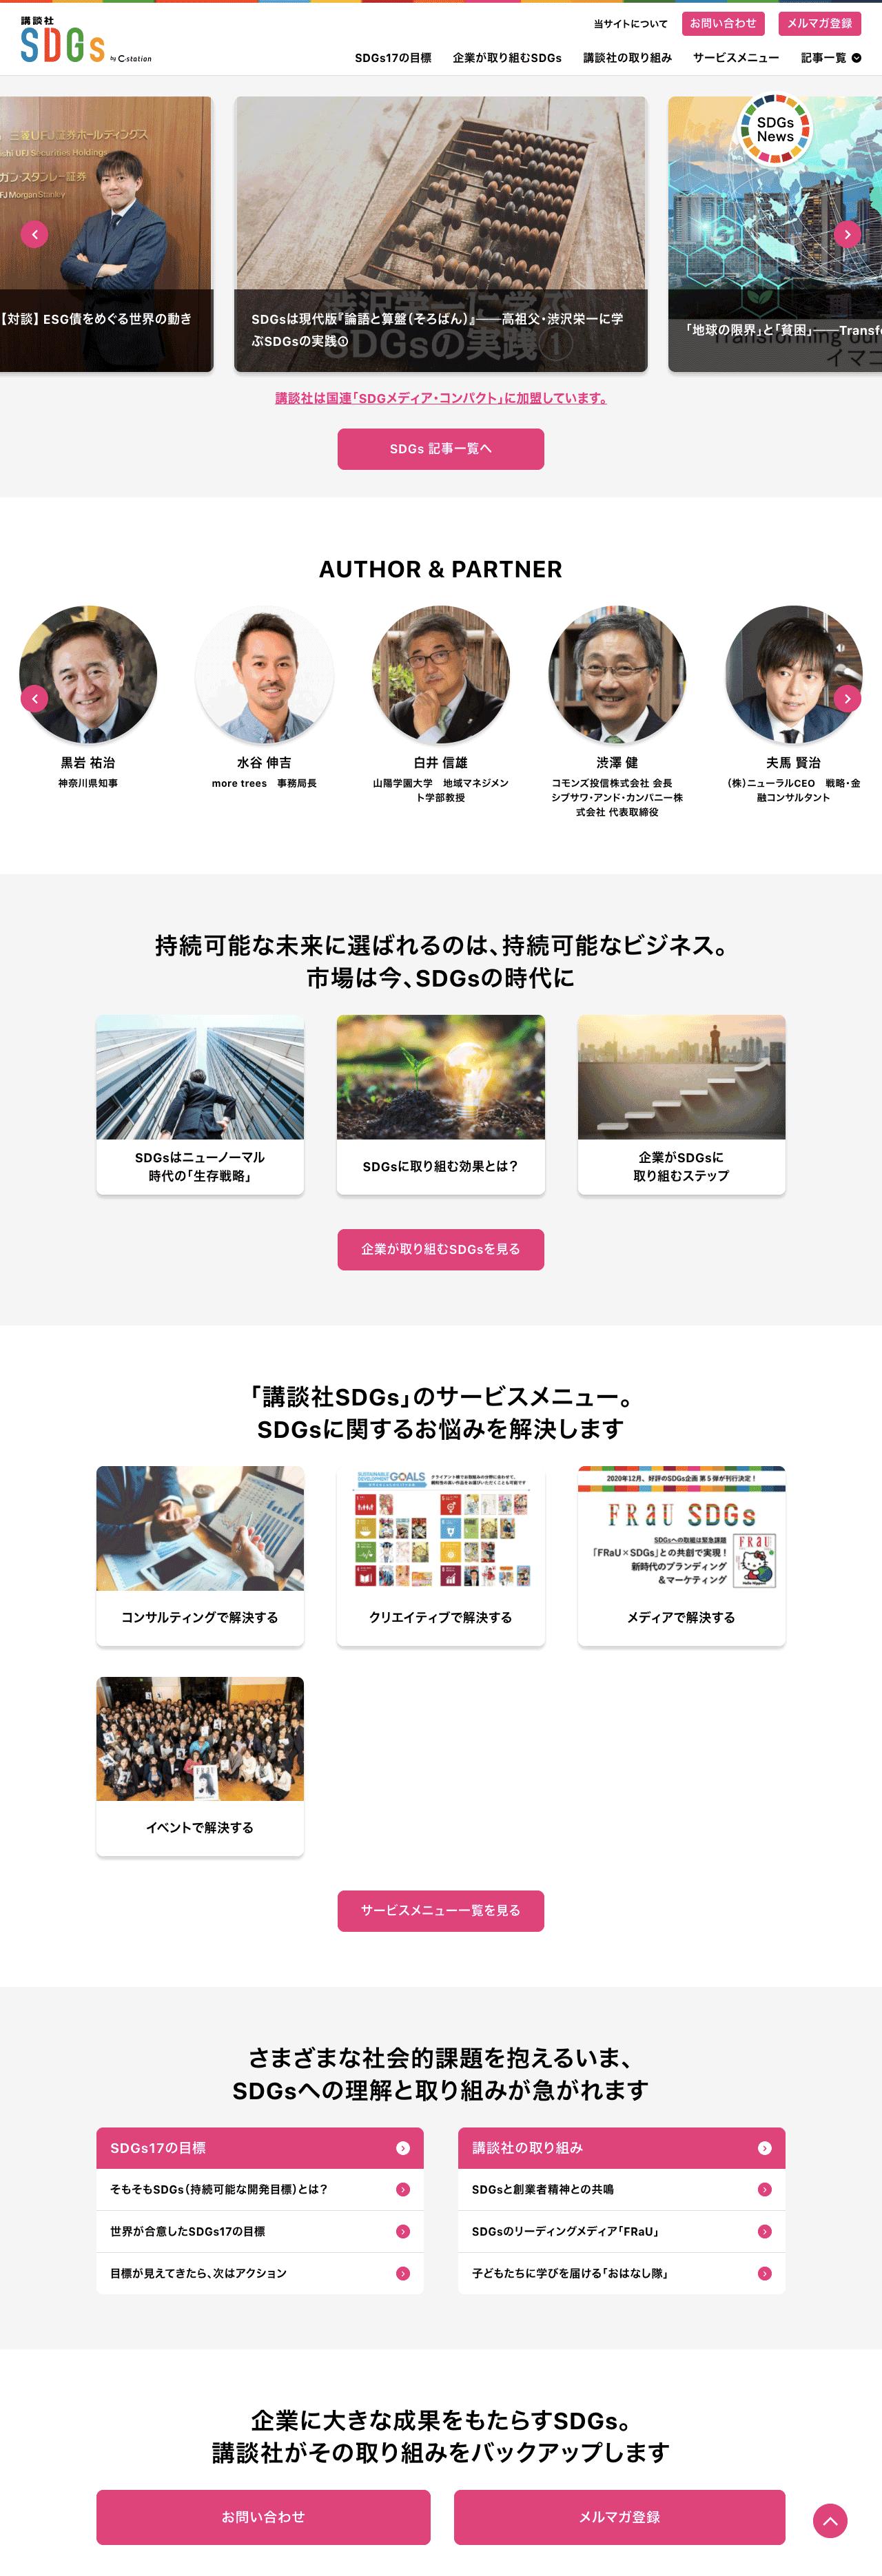 講談社SDGs by C-station